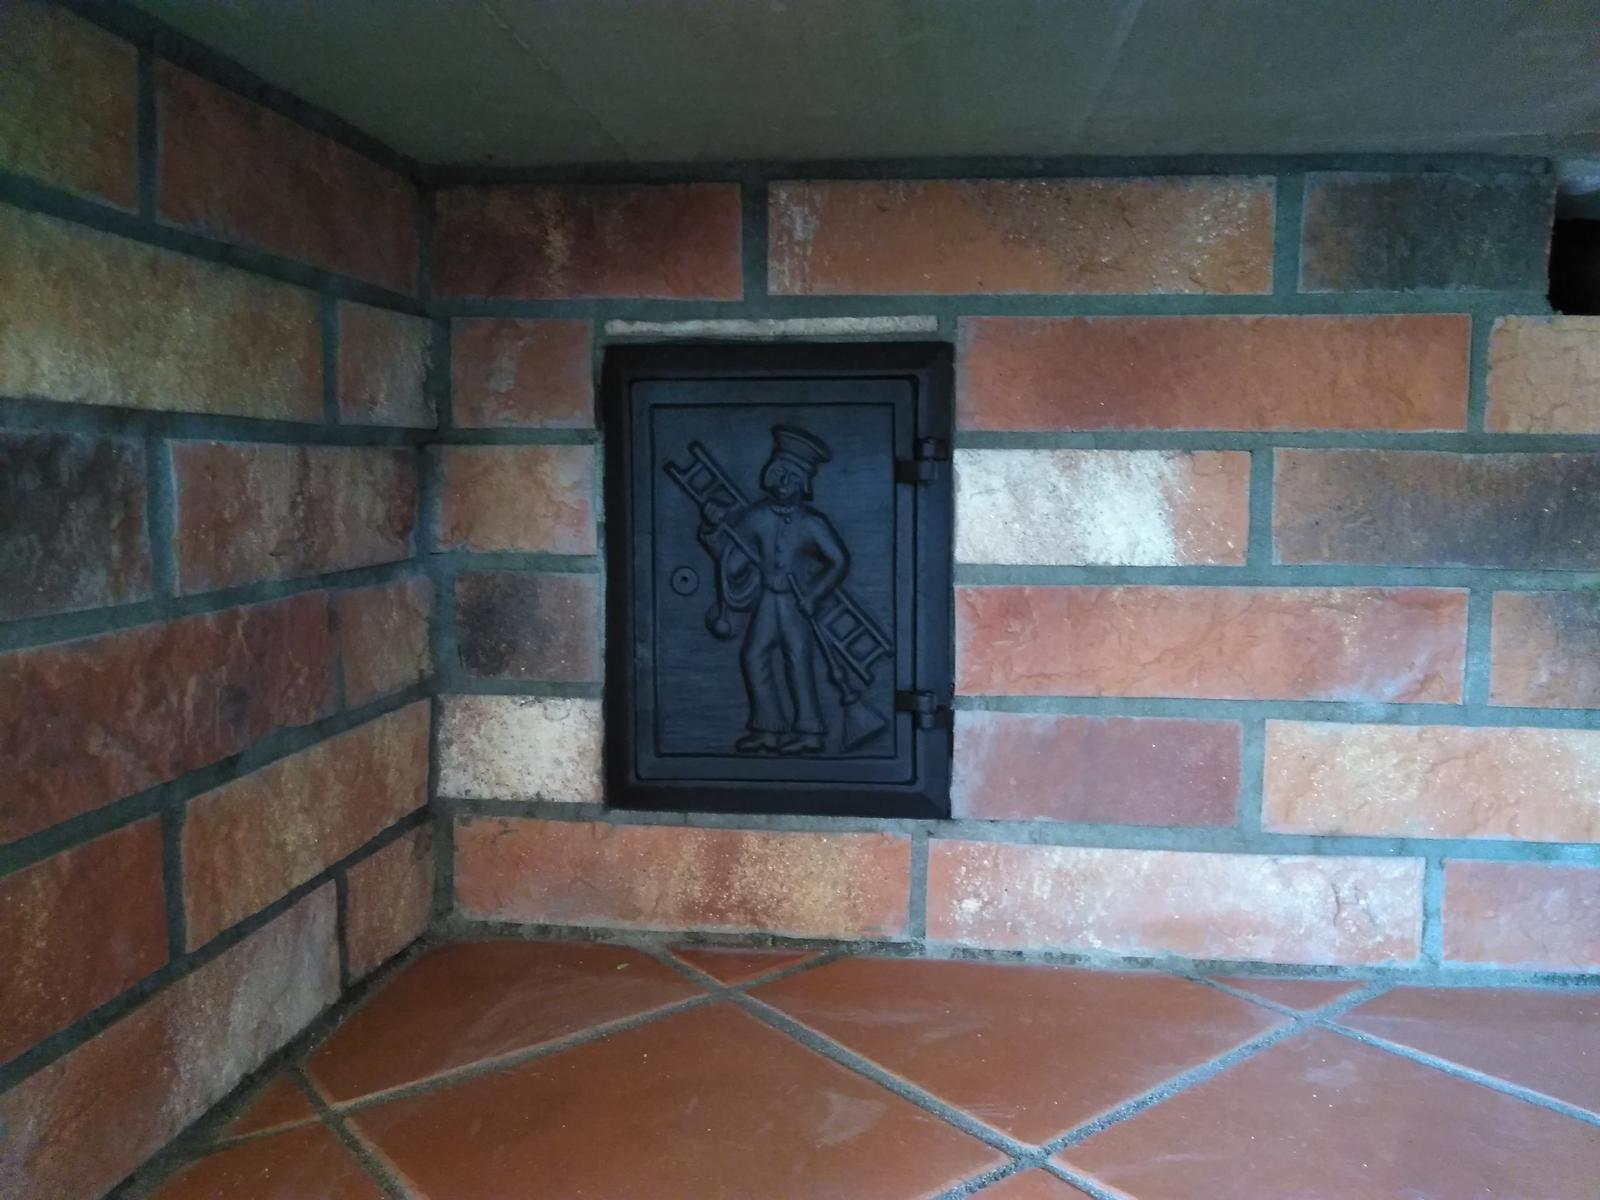 Záhradná kuchyňa - detail čistiacich vrátok od komína pod klenbou...